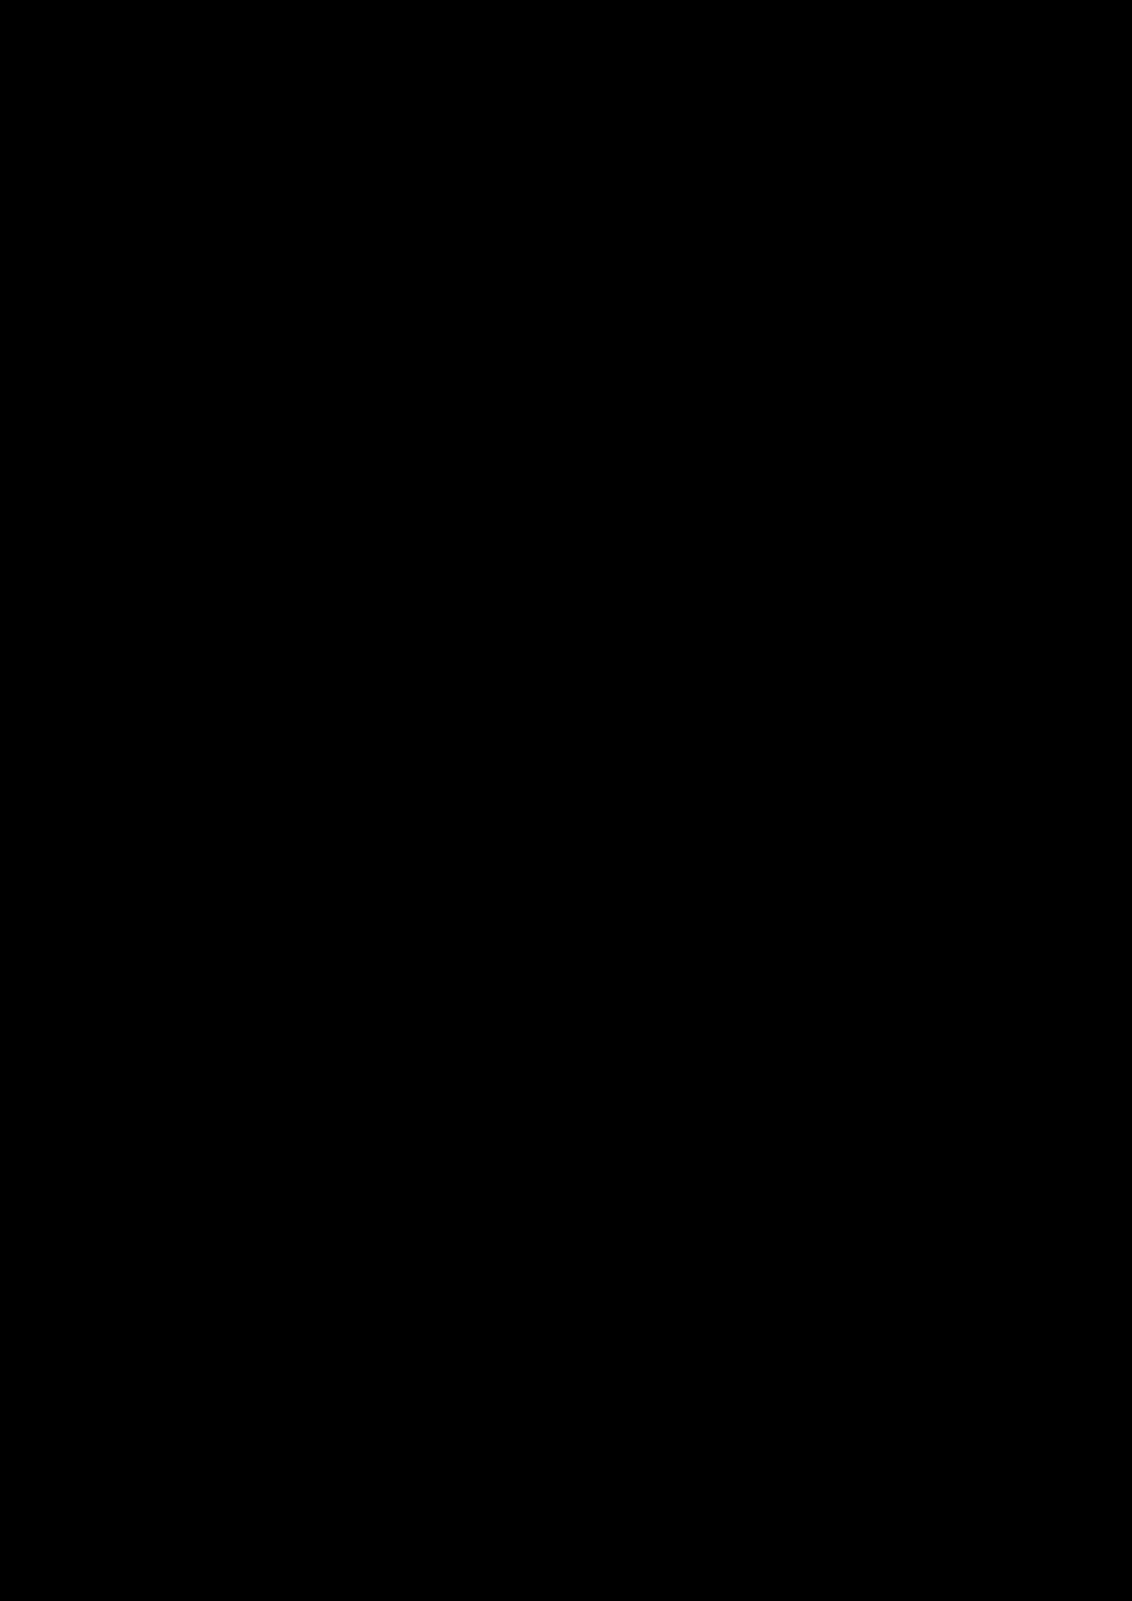 Ten lyubvi slide, Image 24